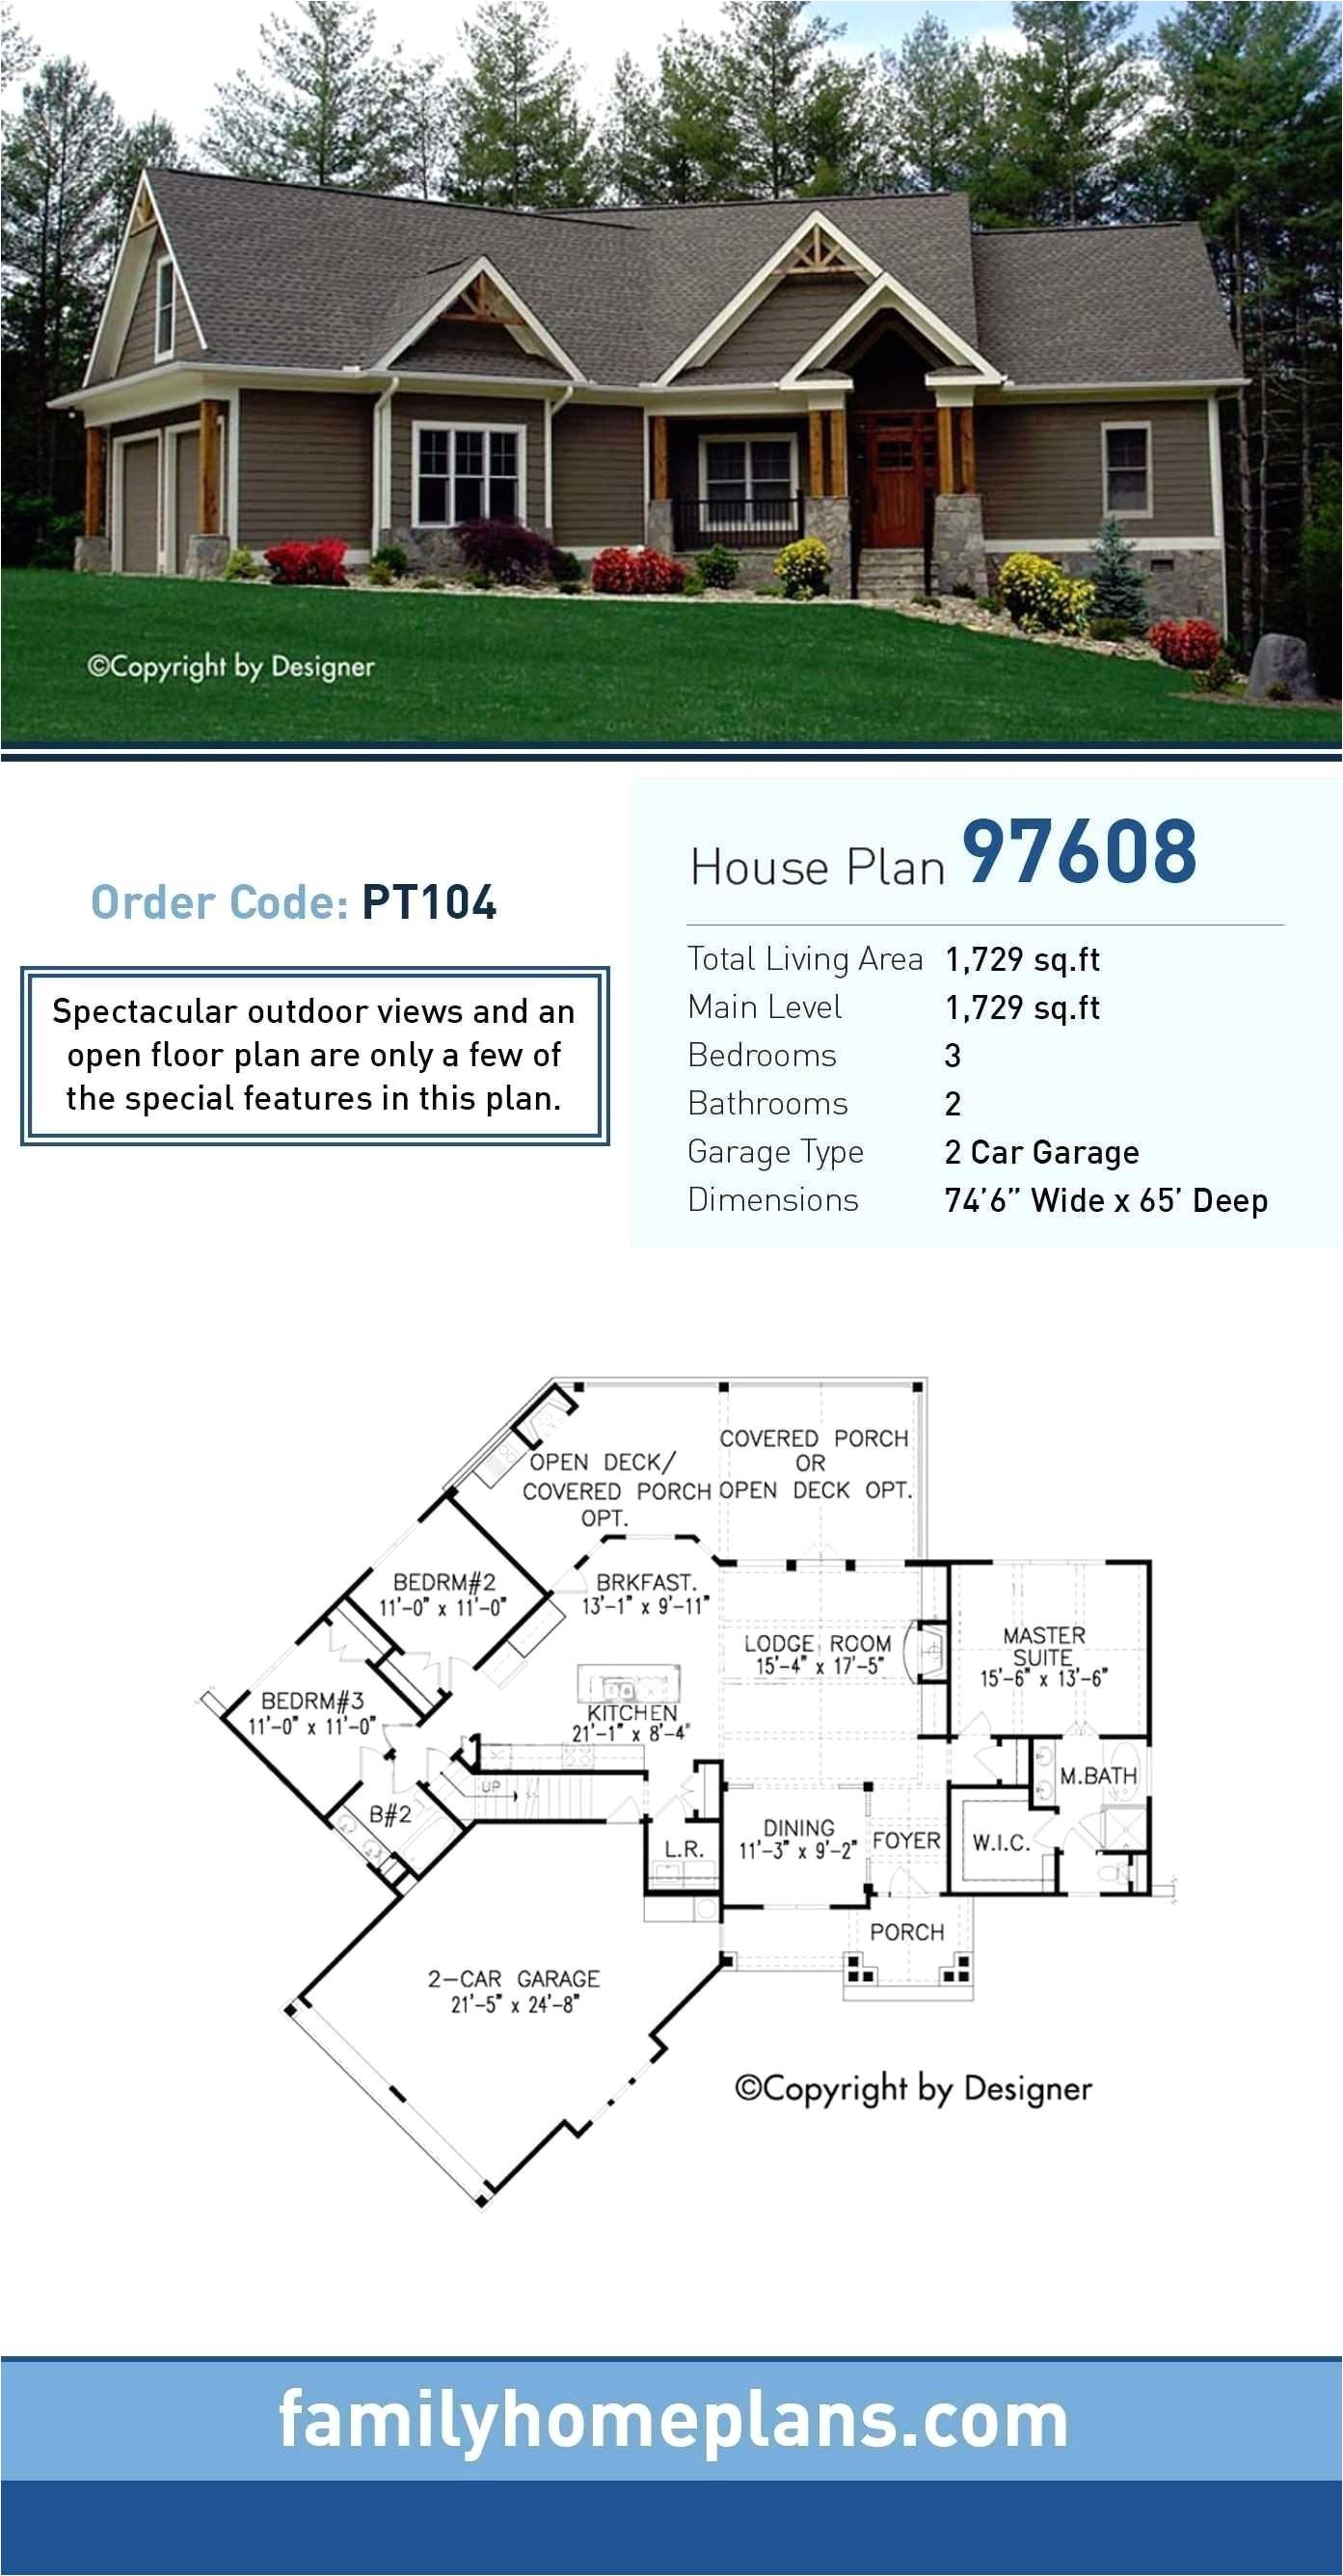 diy dog house ideas lovely heated dog house plans fresh plans for a dog house elegant